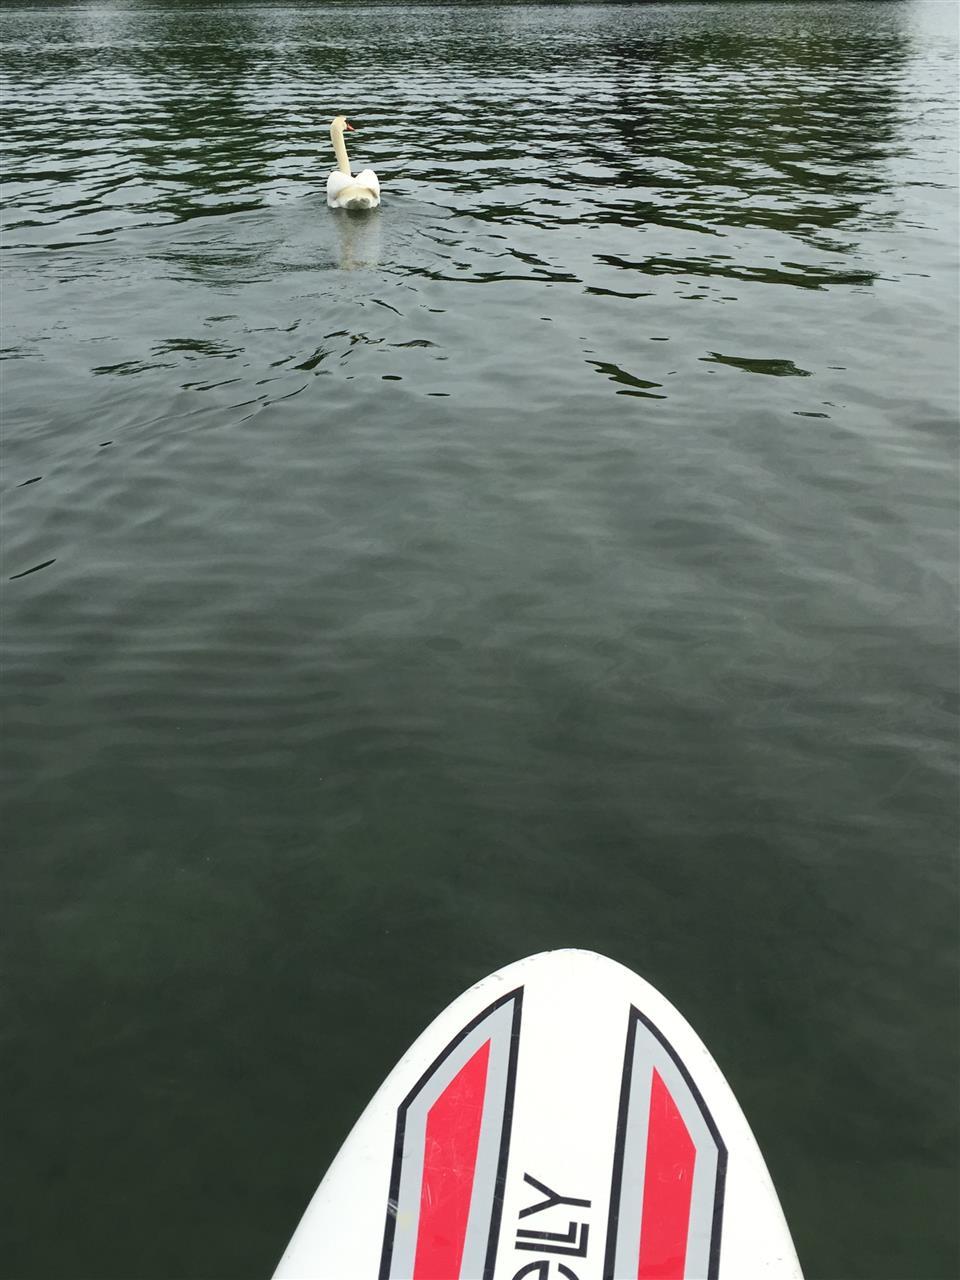 Paddle boarding past the swans. Orchard Lake, Michigan #LeadingRElocal #OrchardLake #Michigan